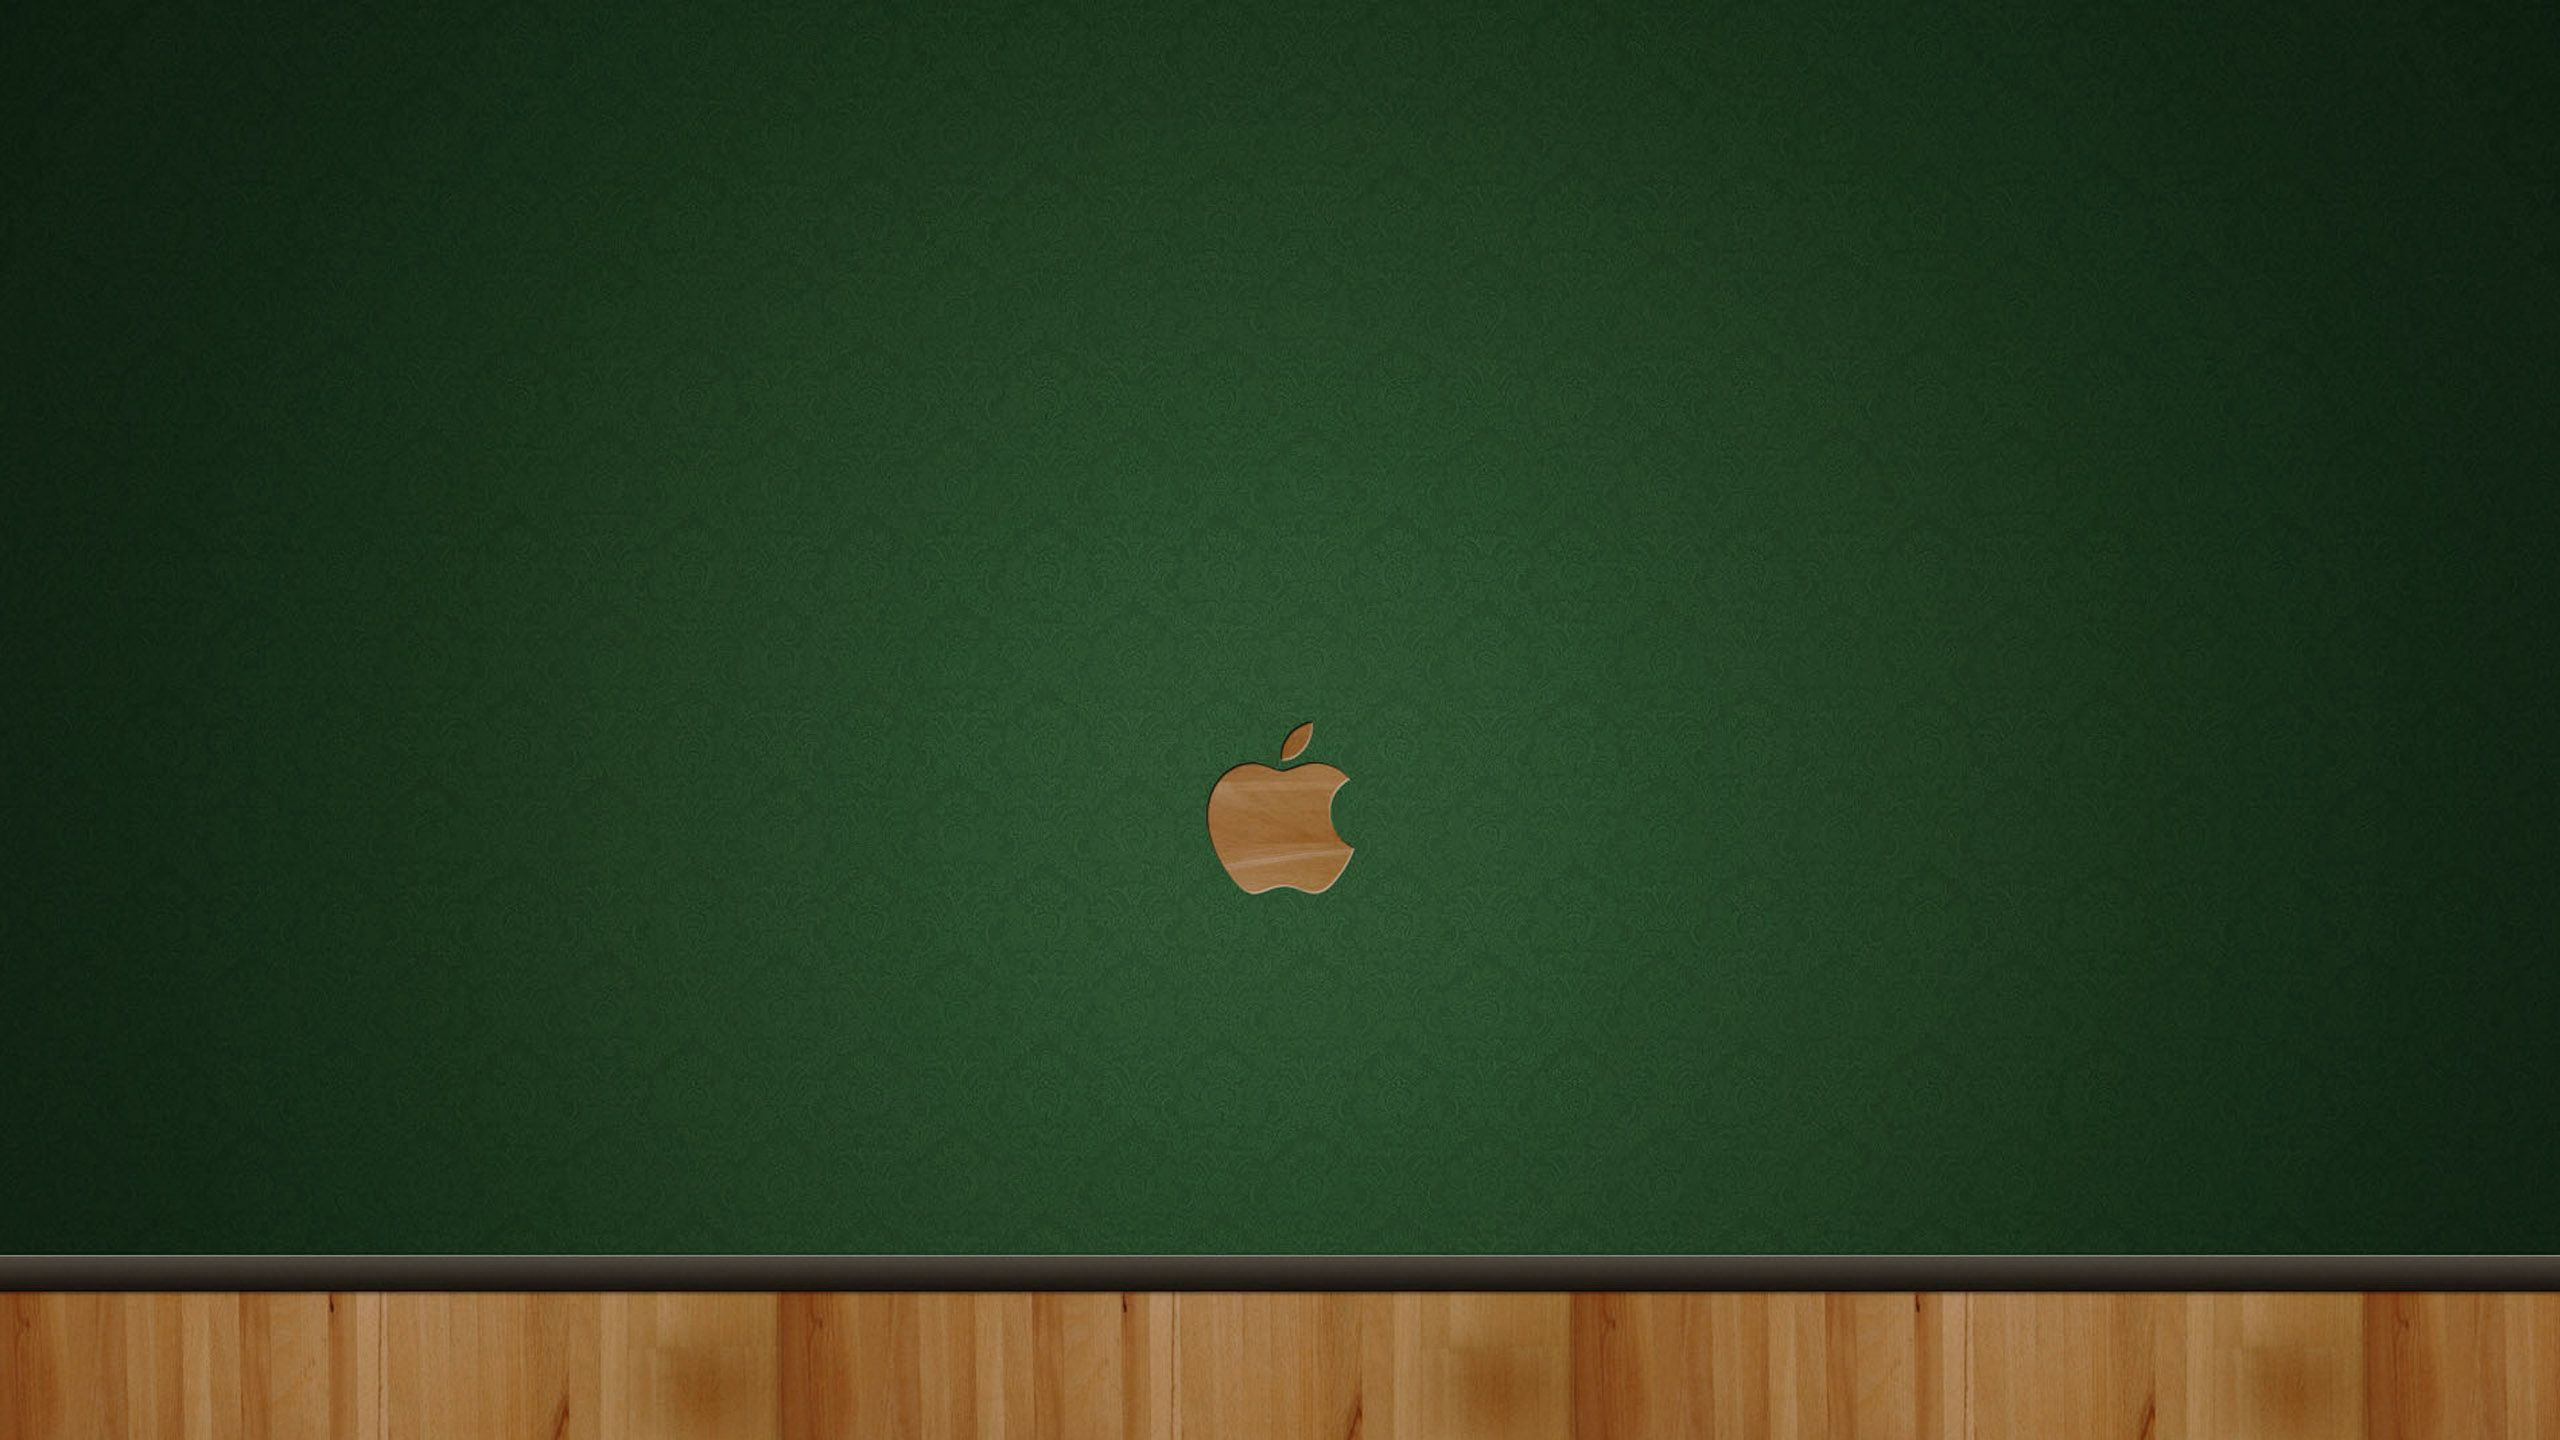 Apple Wallpaper, Desktop, Mac